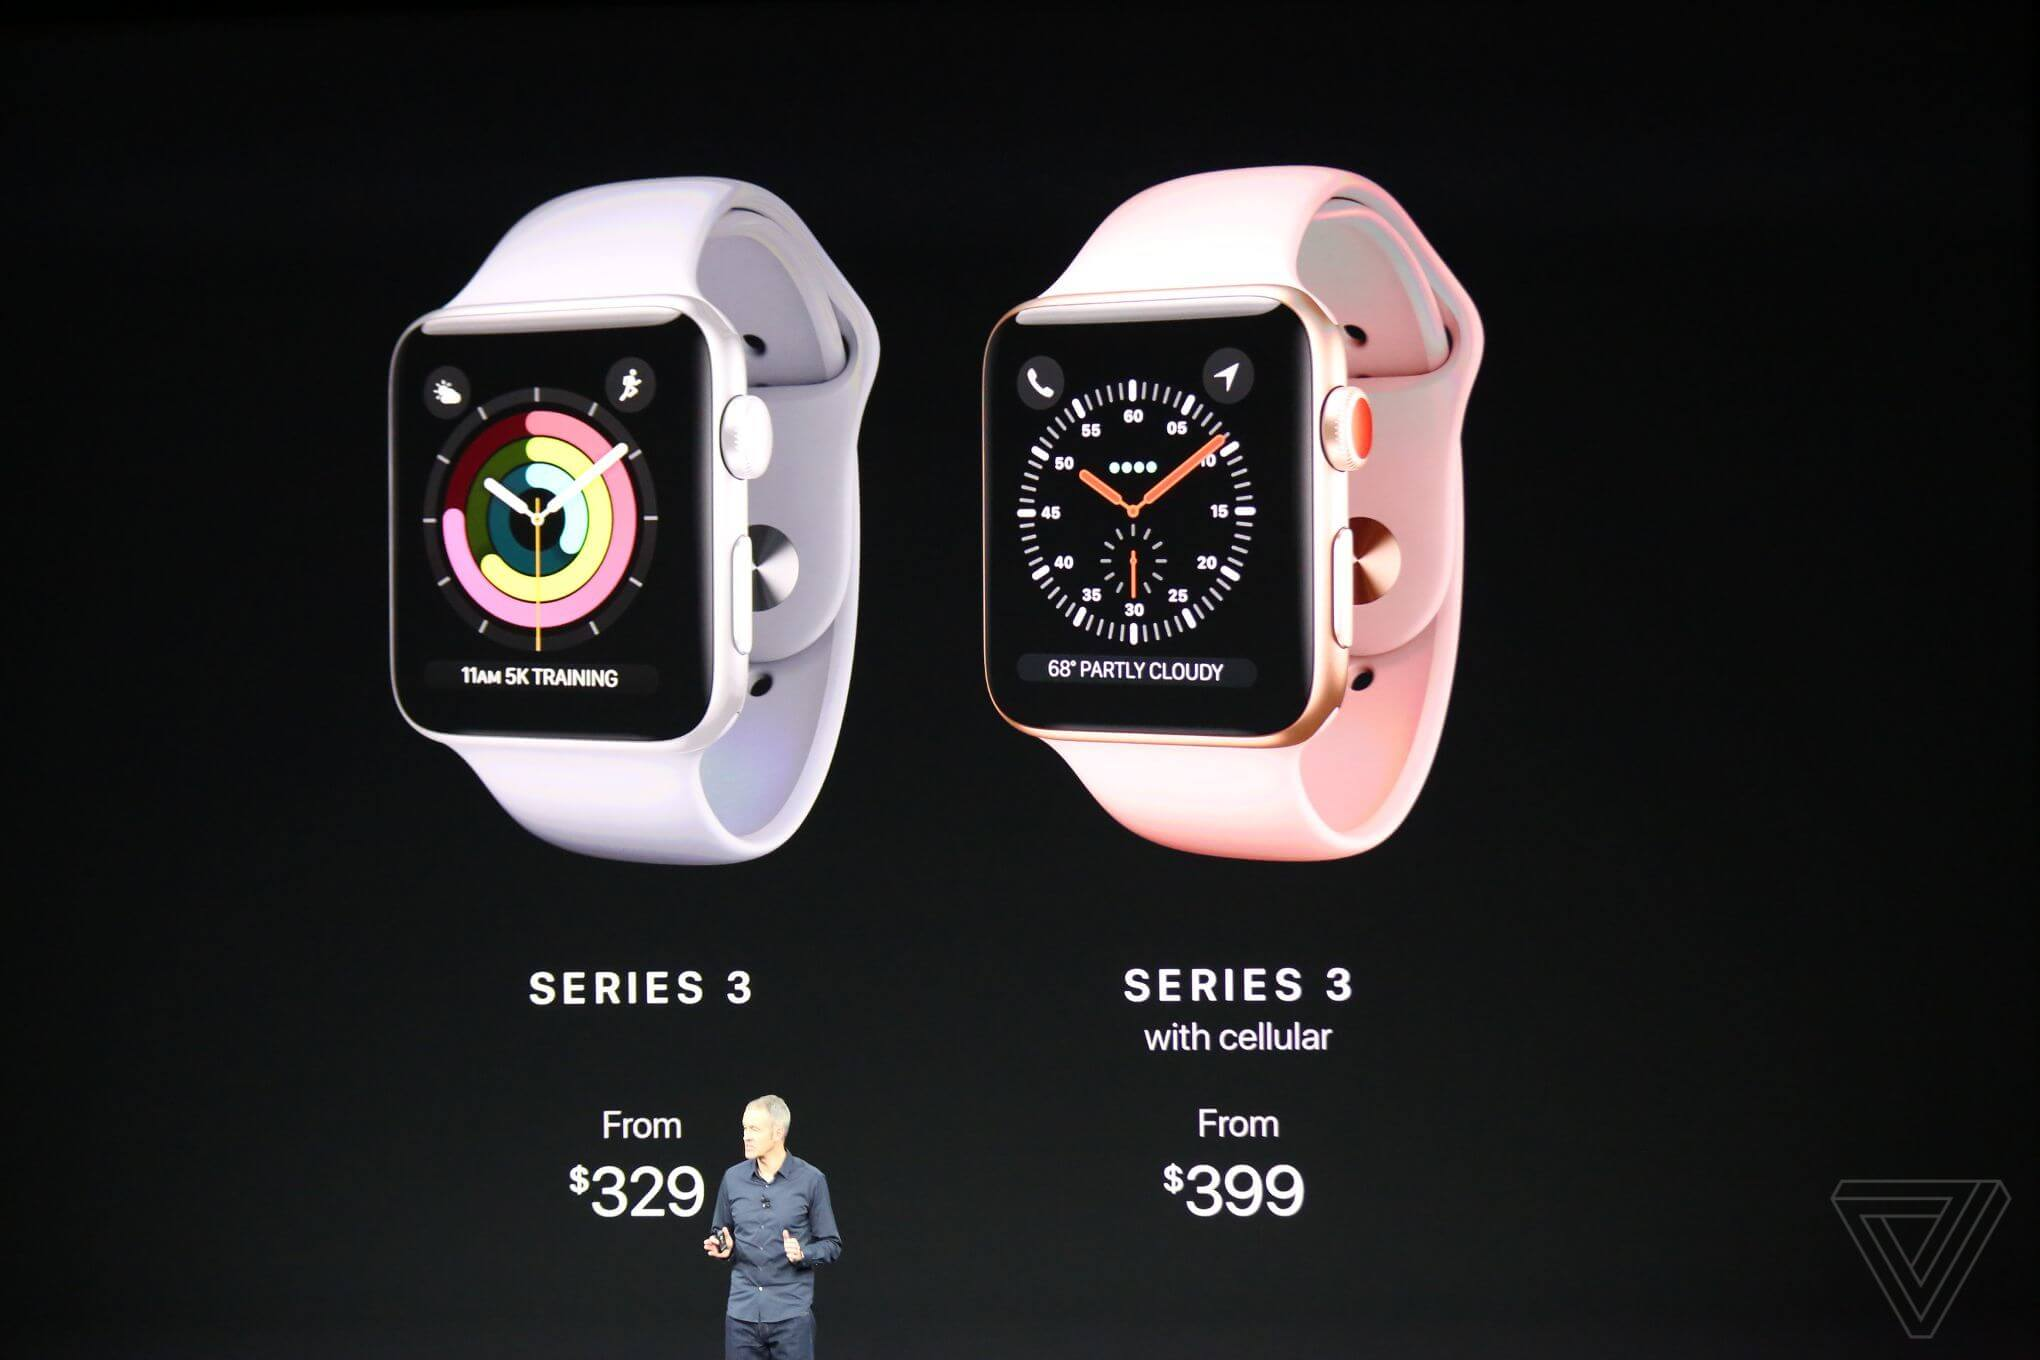 series 3 das kann die neue lte apple watch apfellike. Black Bedroom Furniture Sets. Home Design Ideas